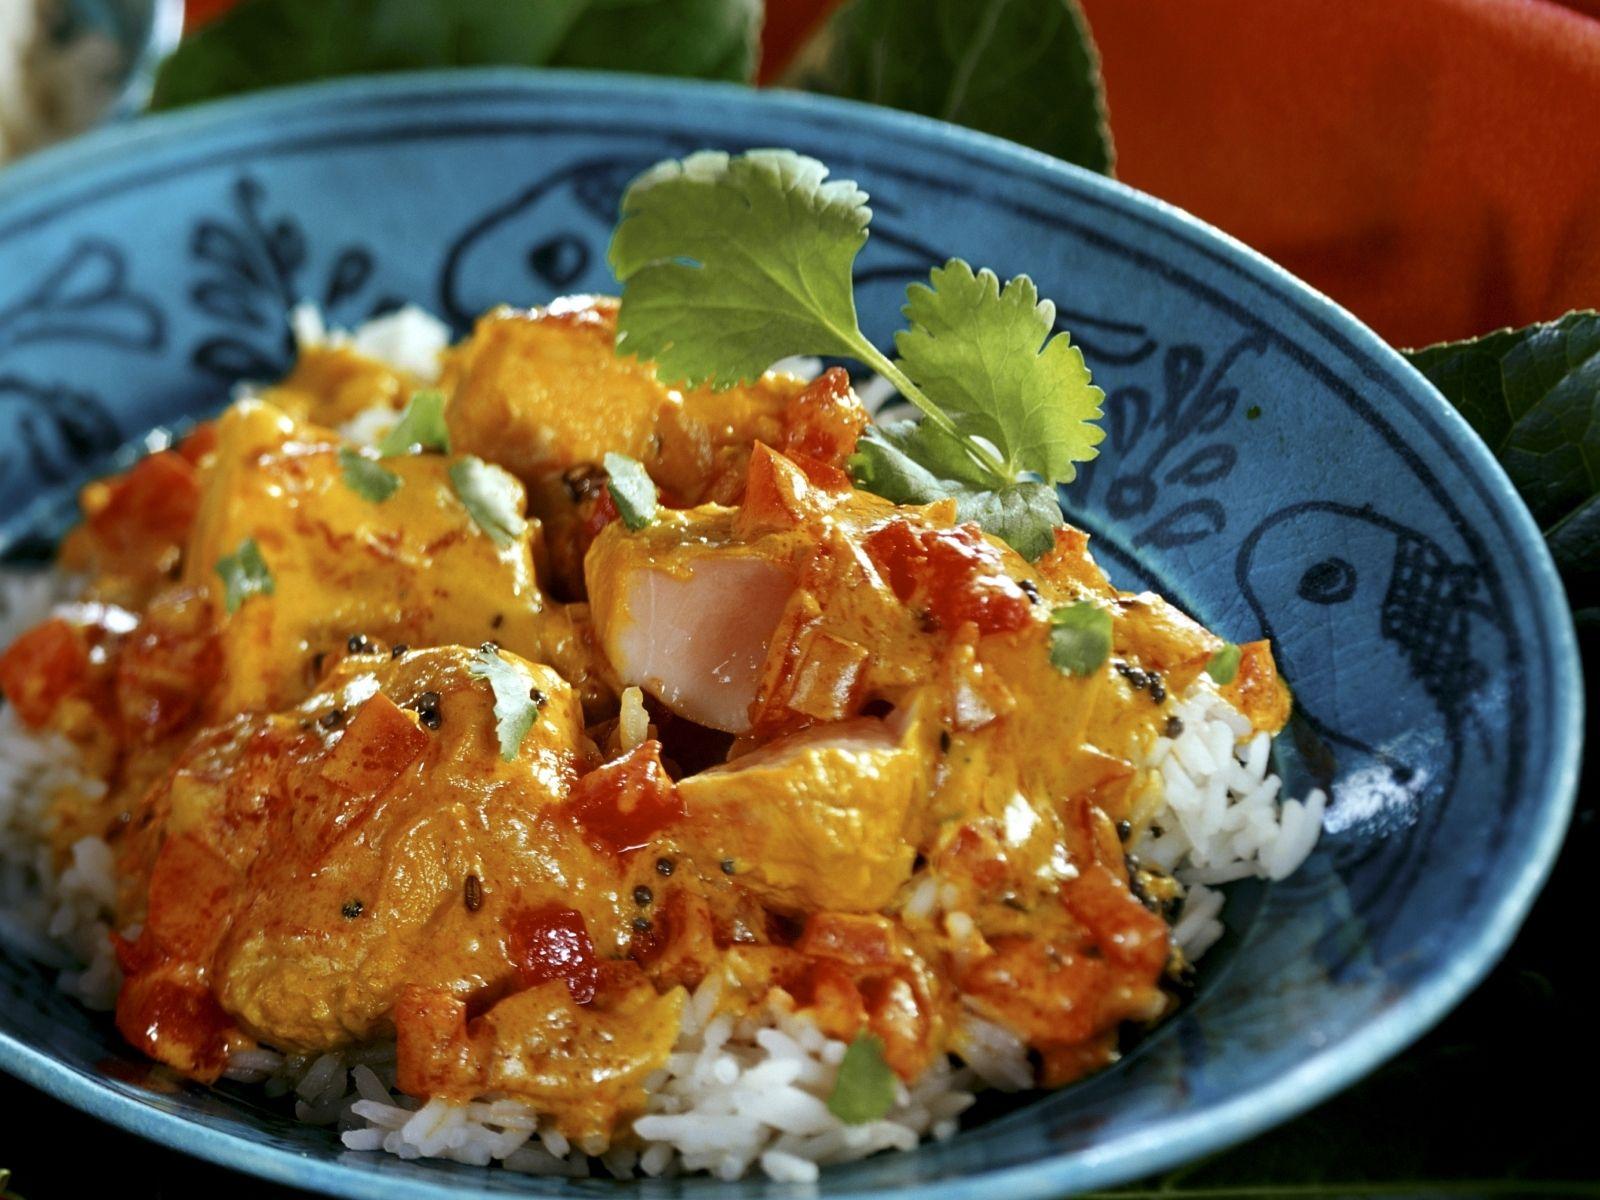 Fischcurry auf indische Art Rezept | EAT SMARTER